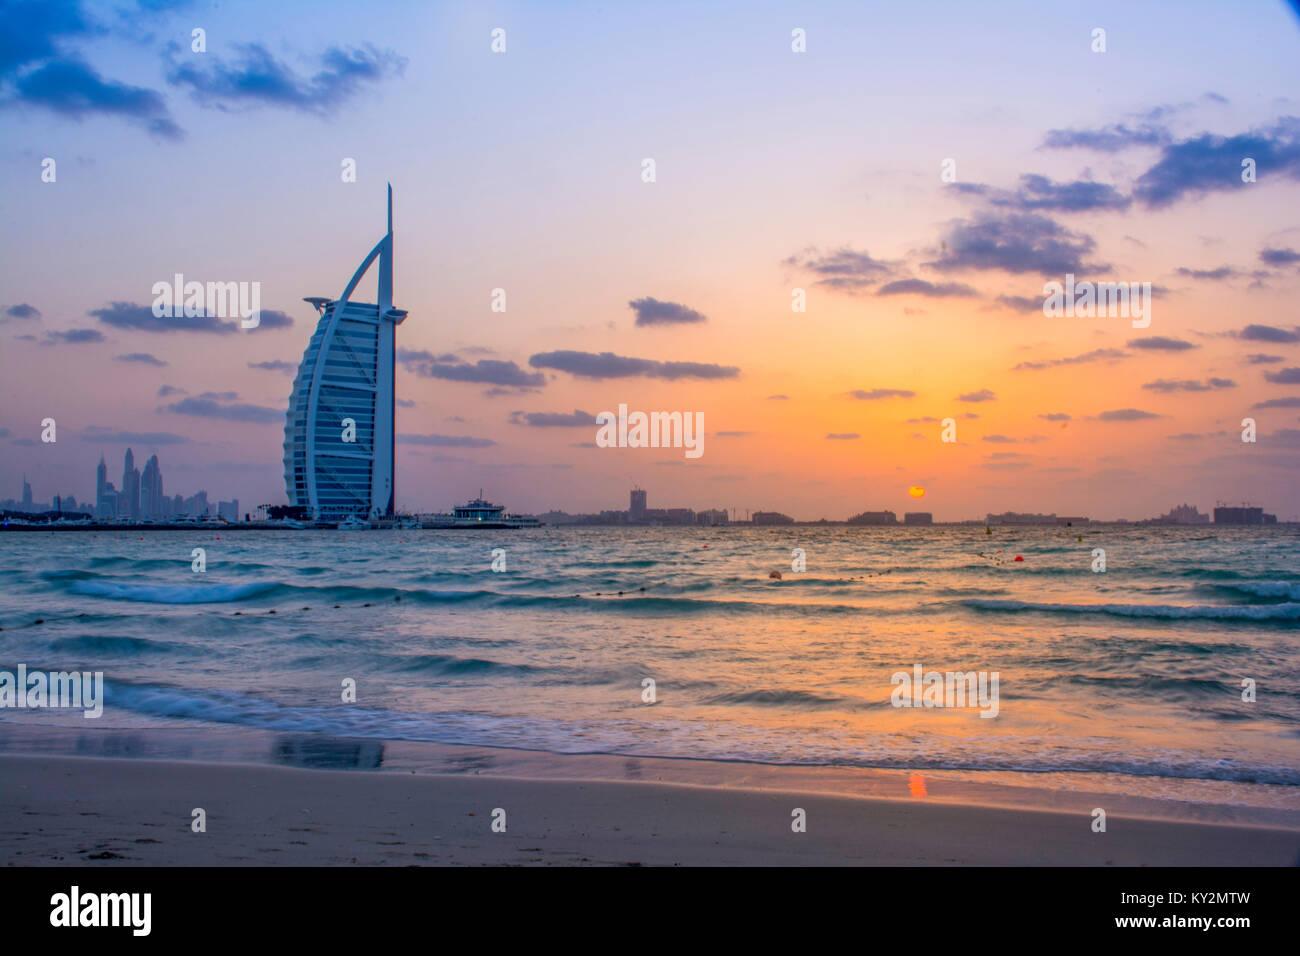 Burj Al Arab Sonnenuntergang - Abend Geschossen von Umm Suqeim Strand - Dubai Stockbild